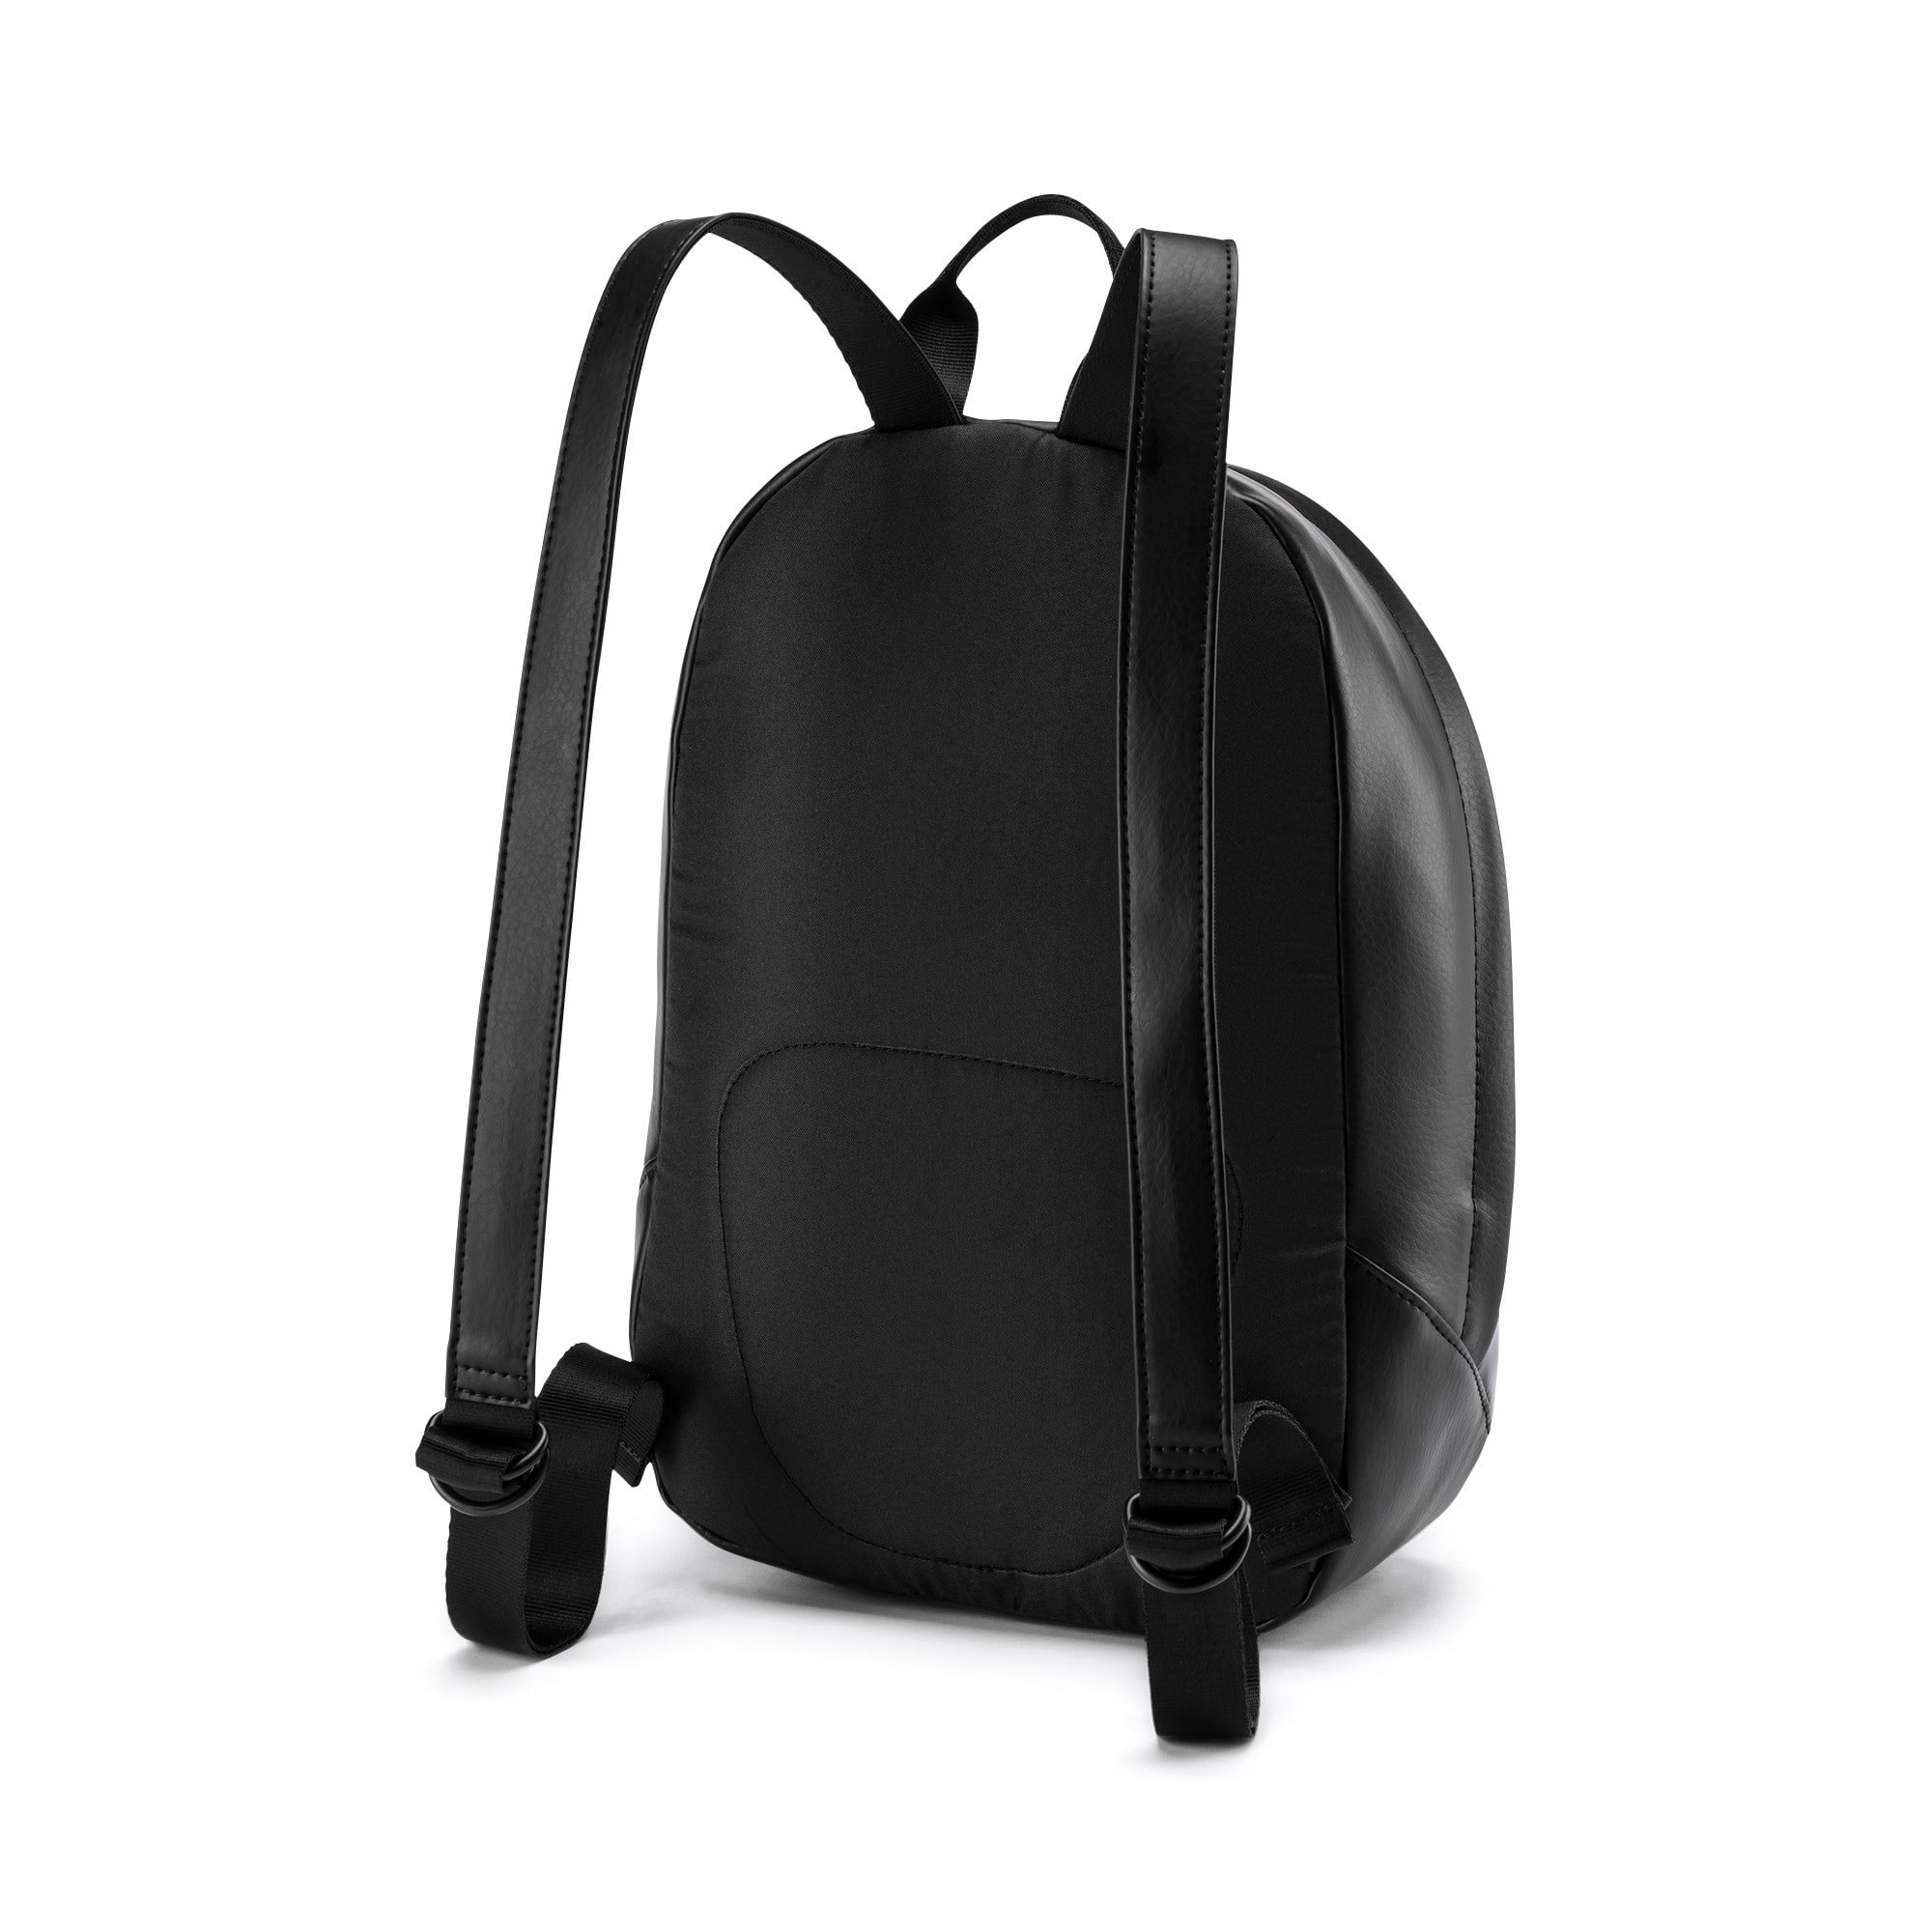 Thumbnail 3 of Prime Premium Archive Backpack, Puma Black, medium